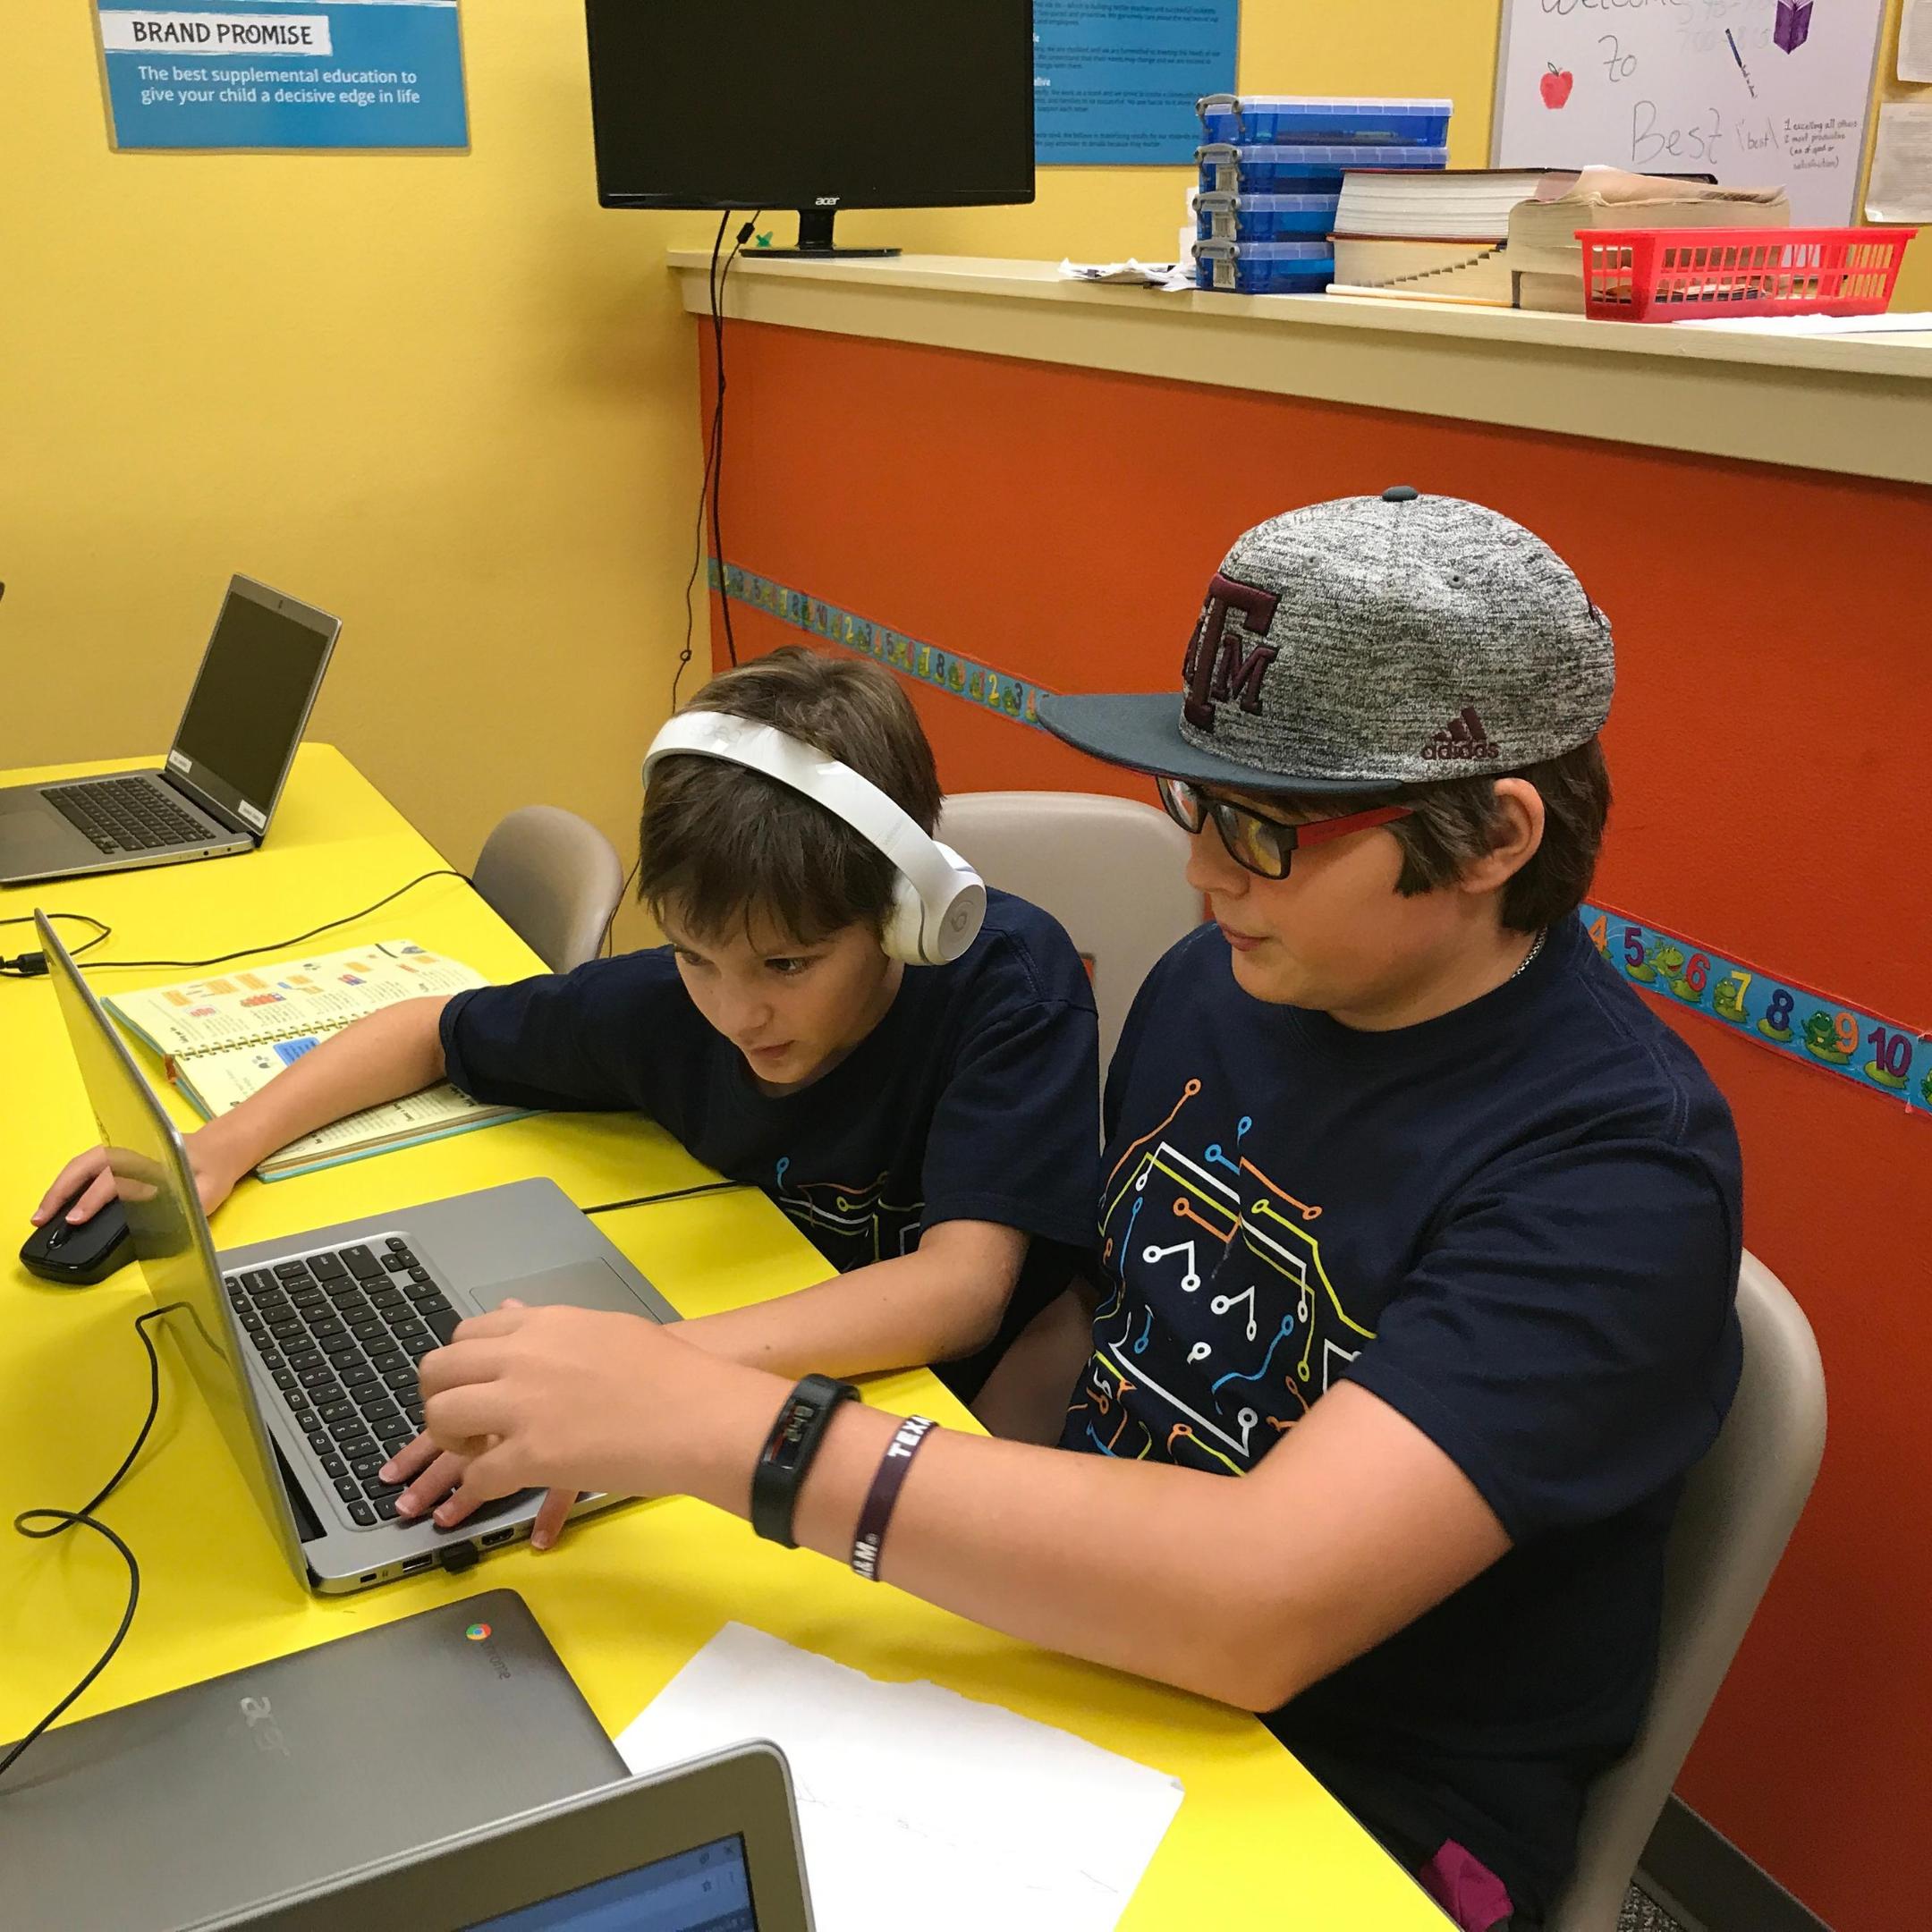 Minecraft Server and Modding Options Coder Kids